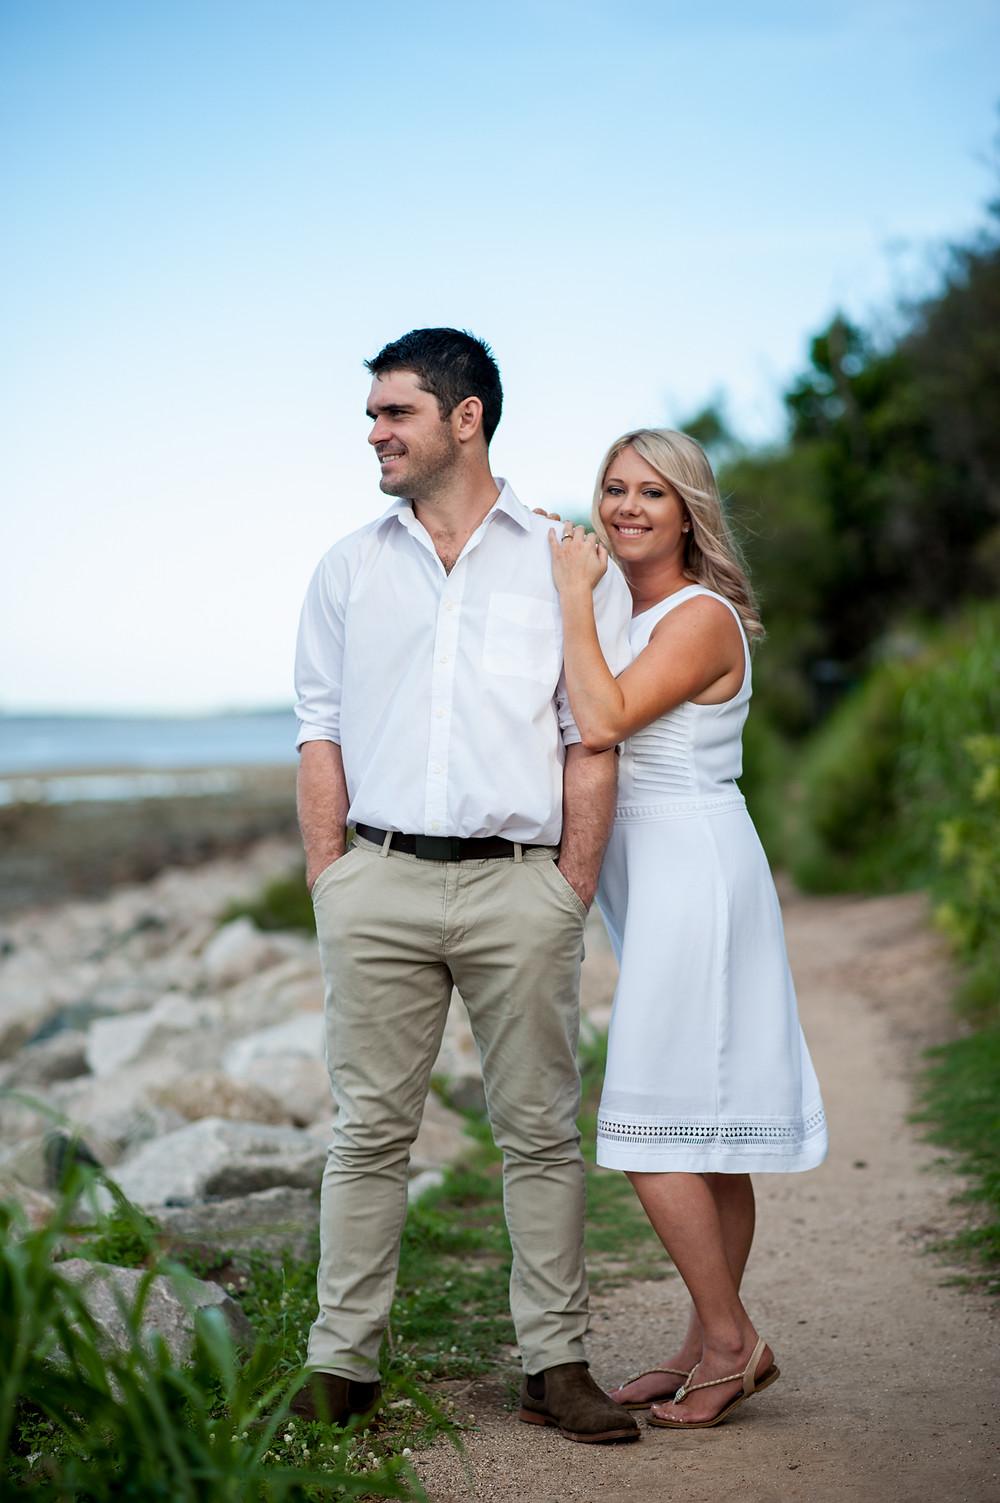 Jay Brosnan Photography | JBP | Sunshine Coast Wedding Photographer | Brisbane Wedding Photographer